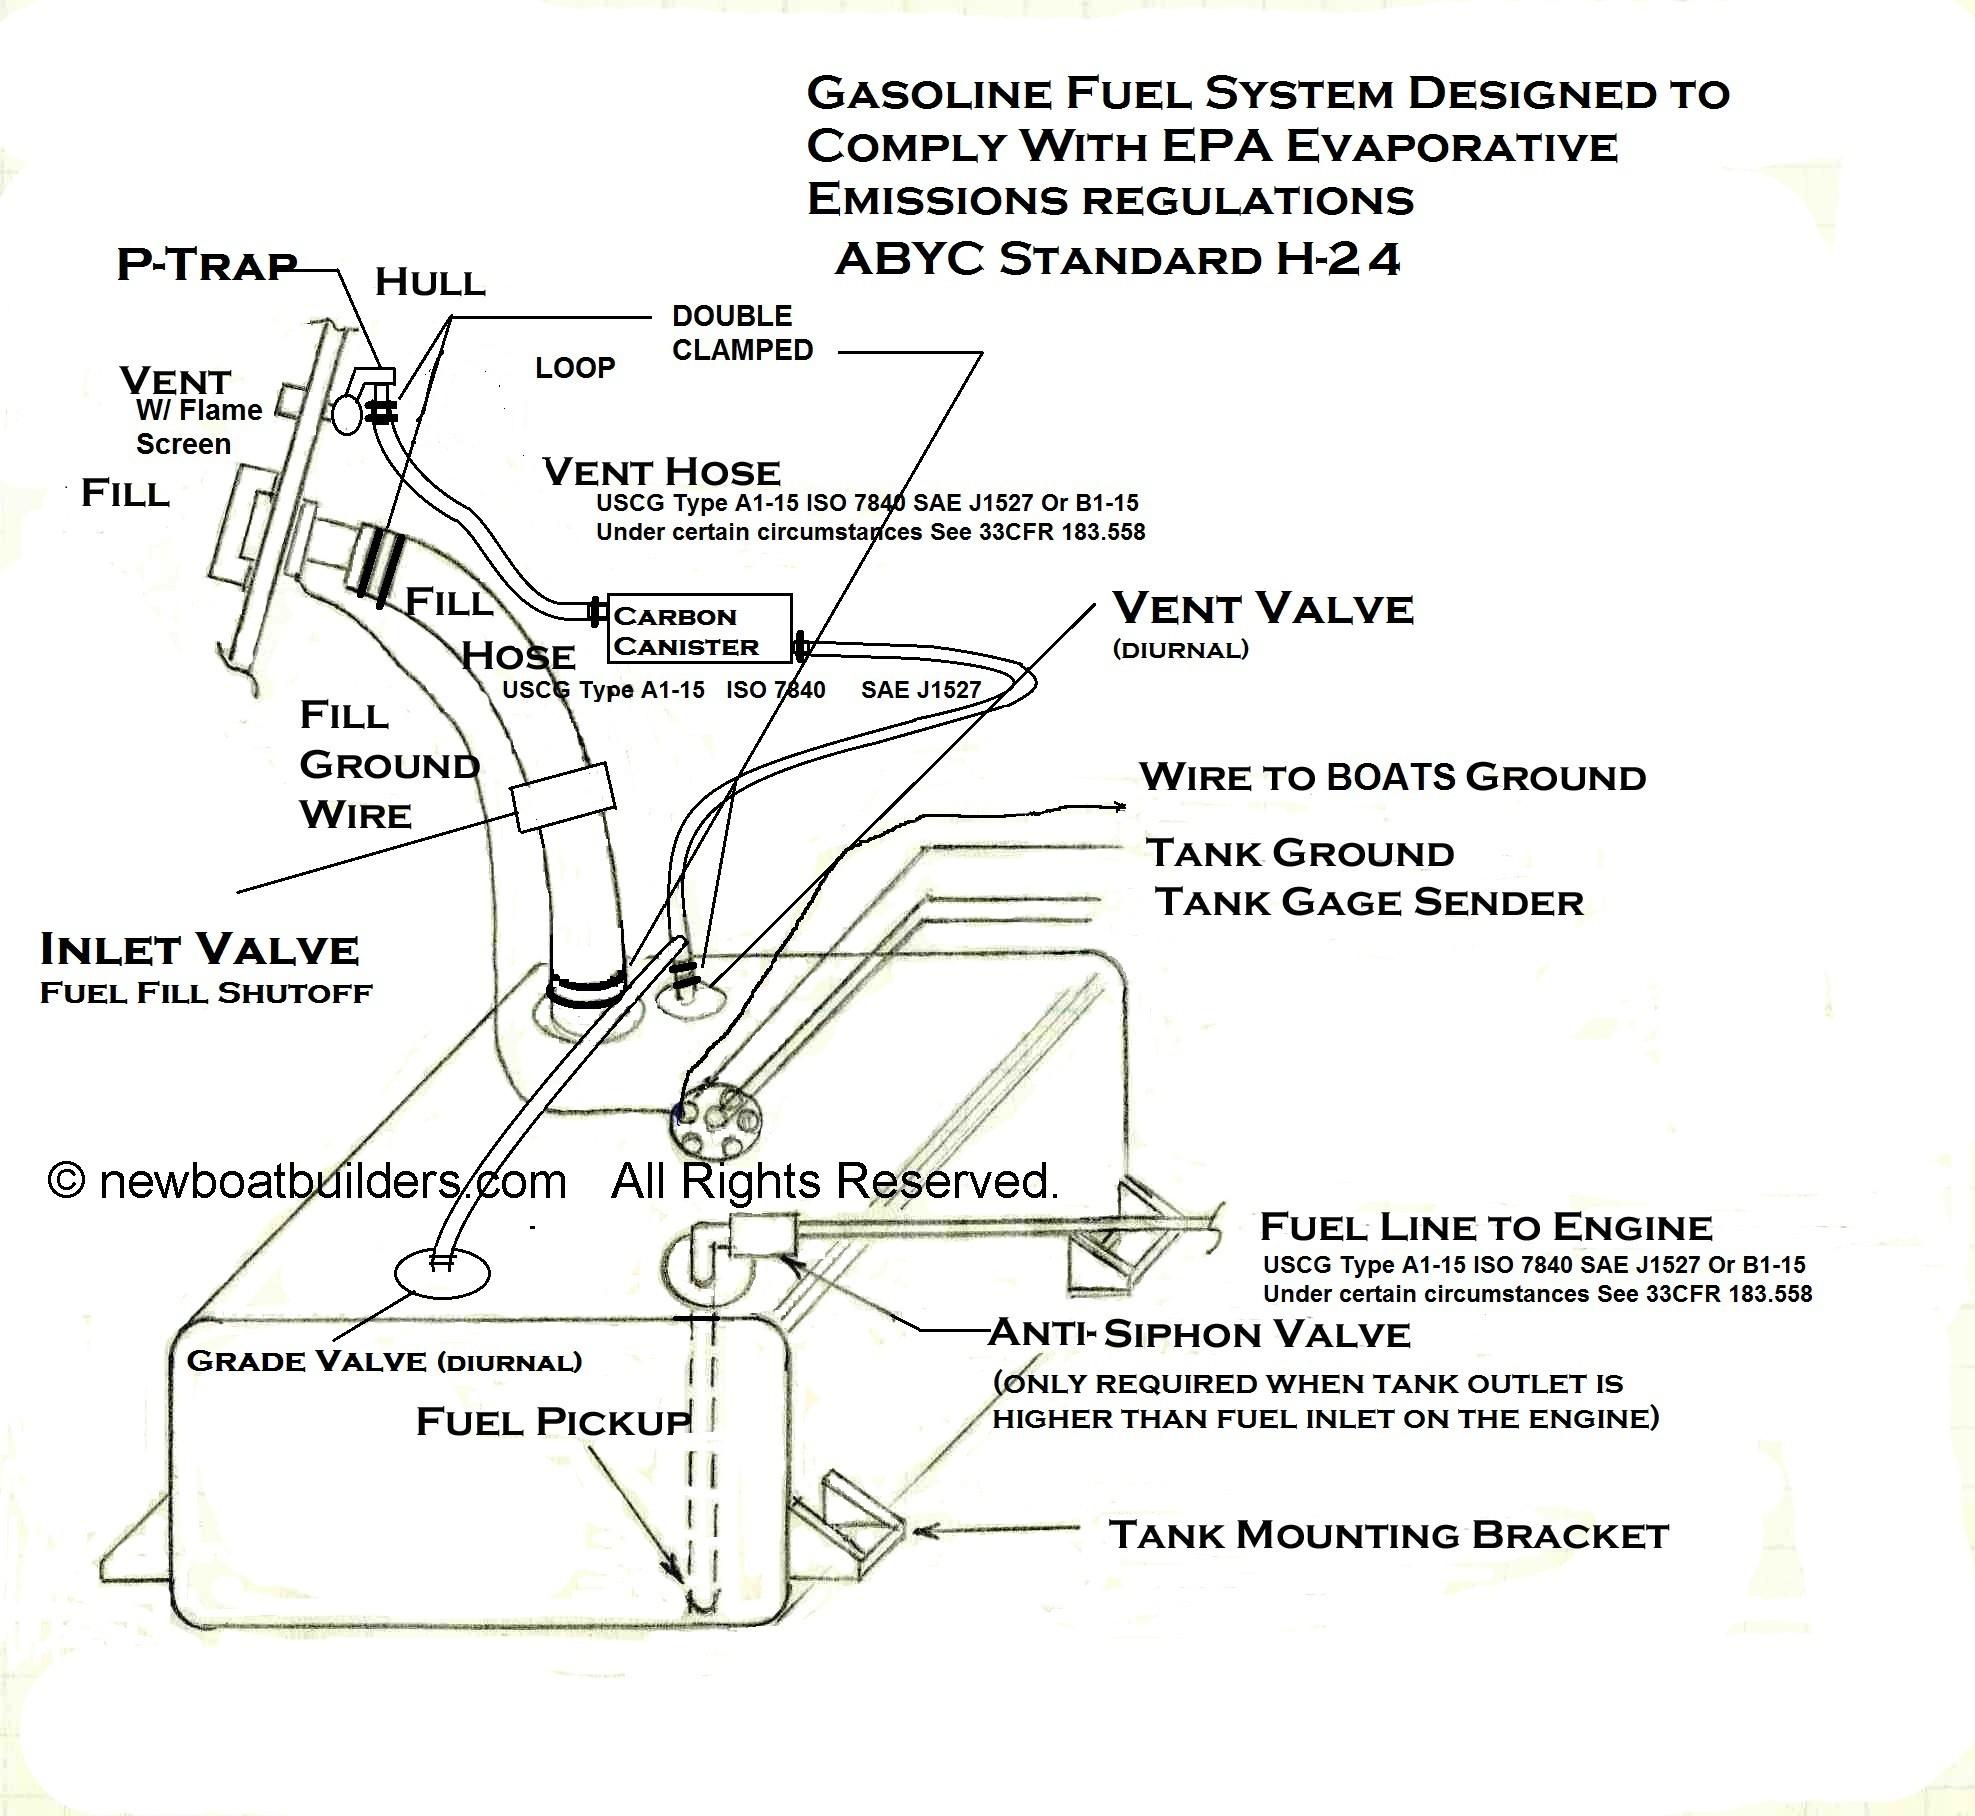 Diesel Engine Fuel System Diagram Fuel Transfer Of Diesel Engine Fuel System Diagram